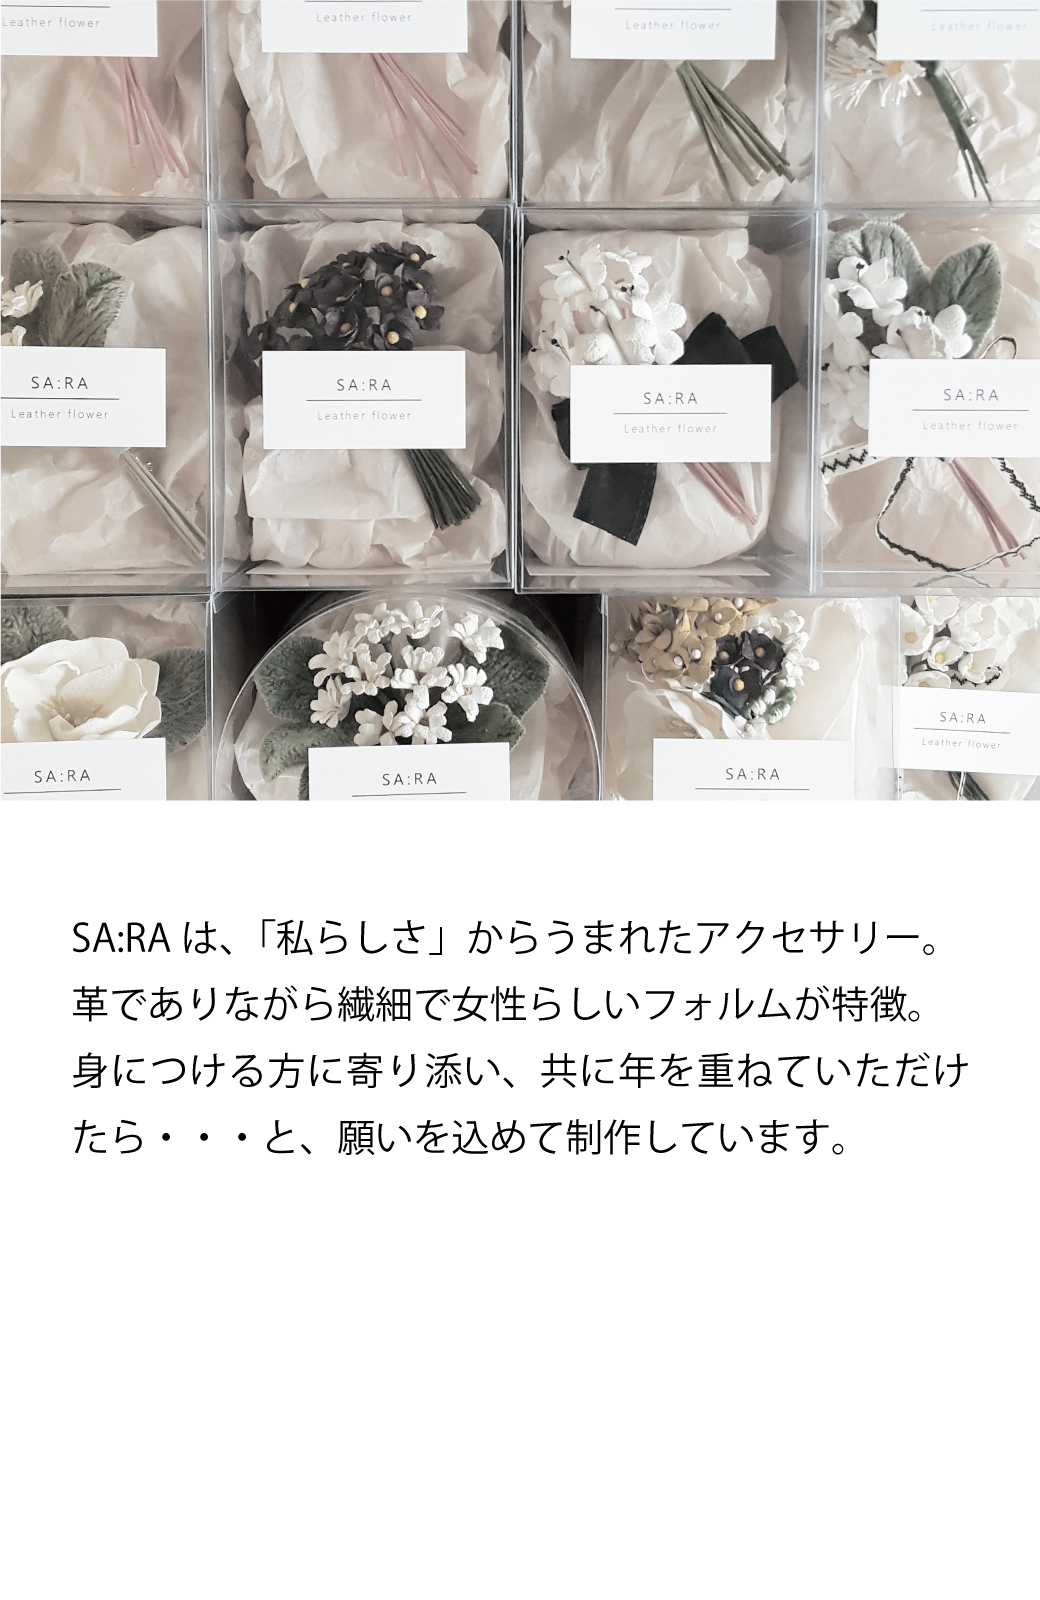 haco! てとひとて SA:RA clear flower イヤリング <ゴールド系その他>の商品写真4